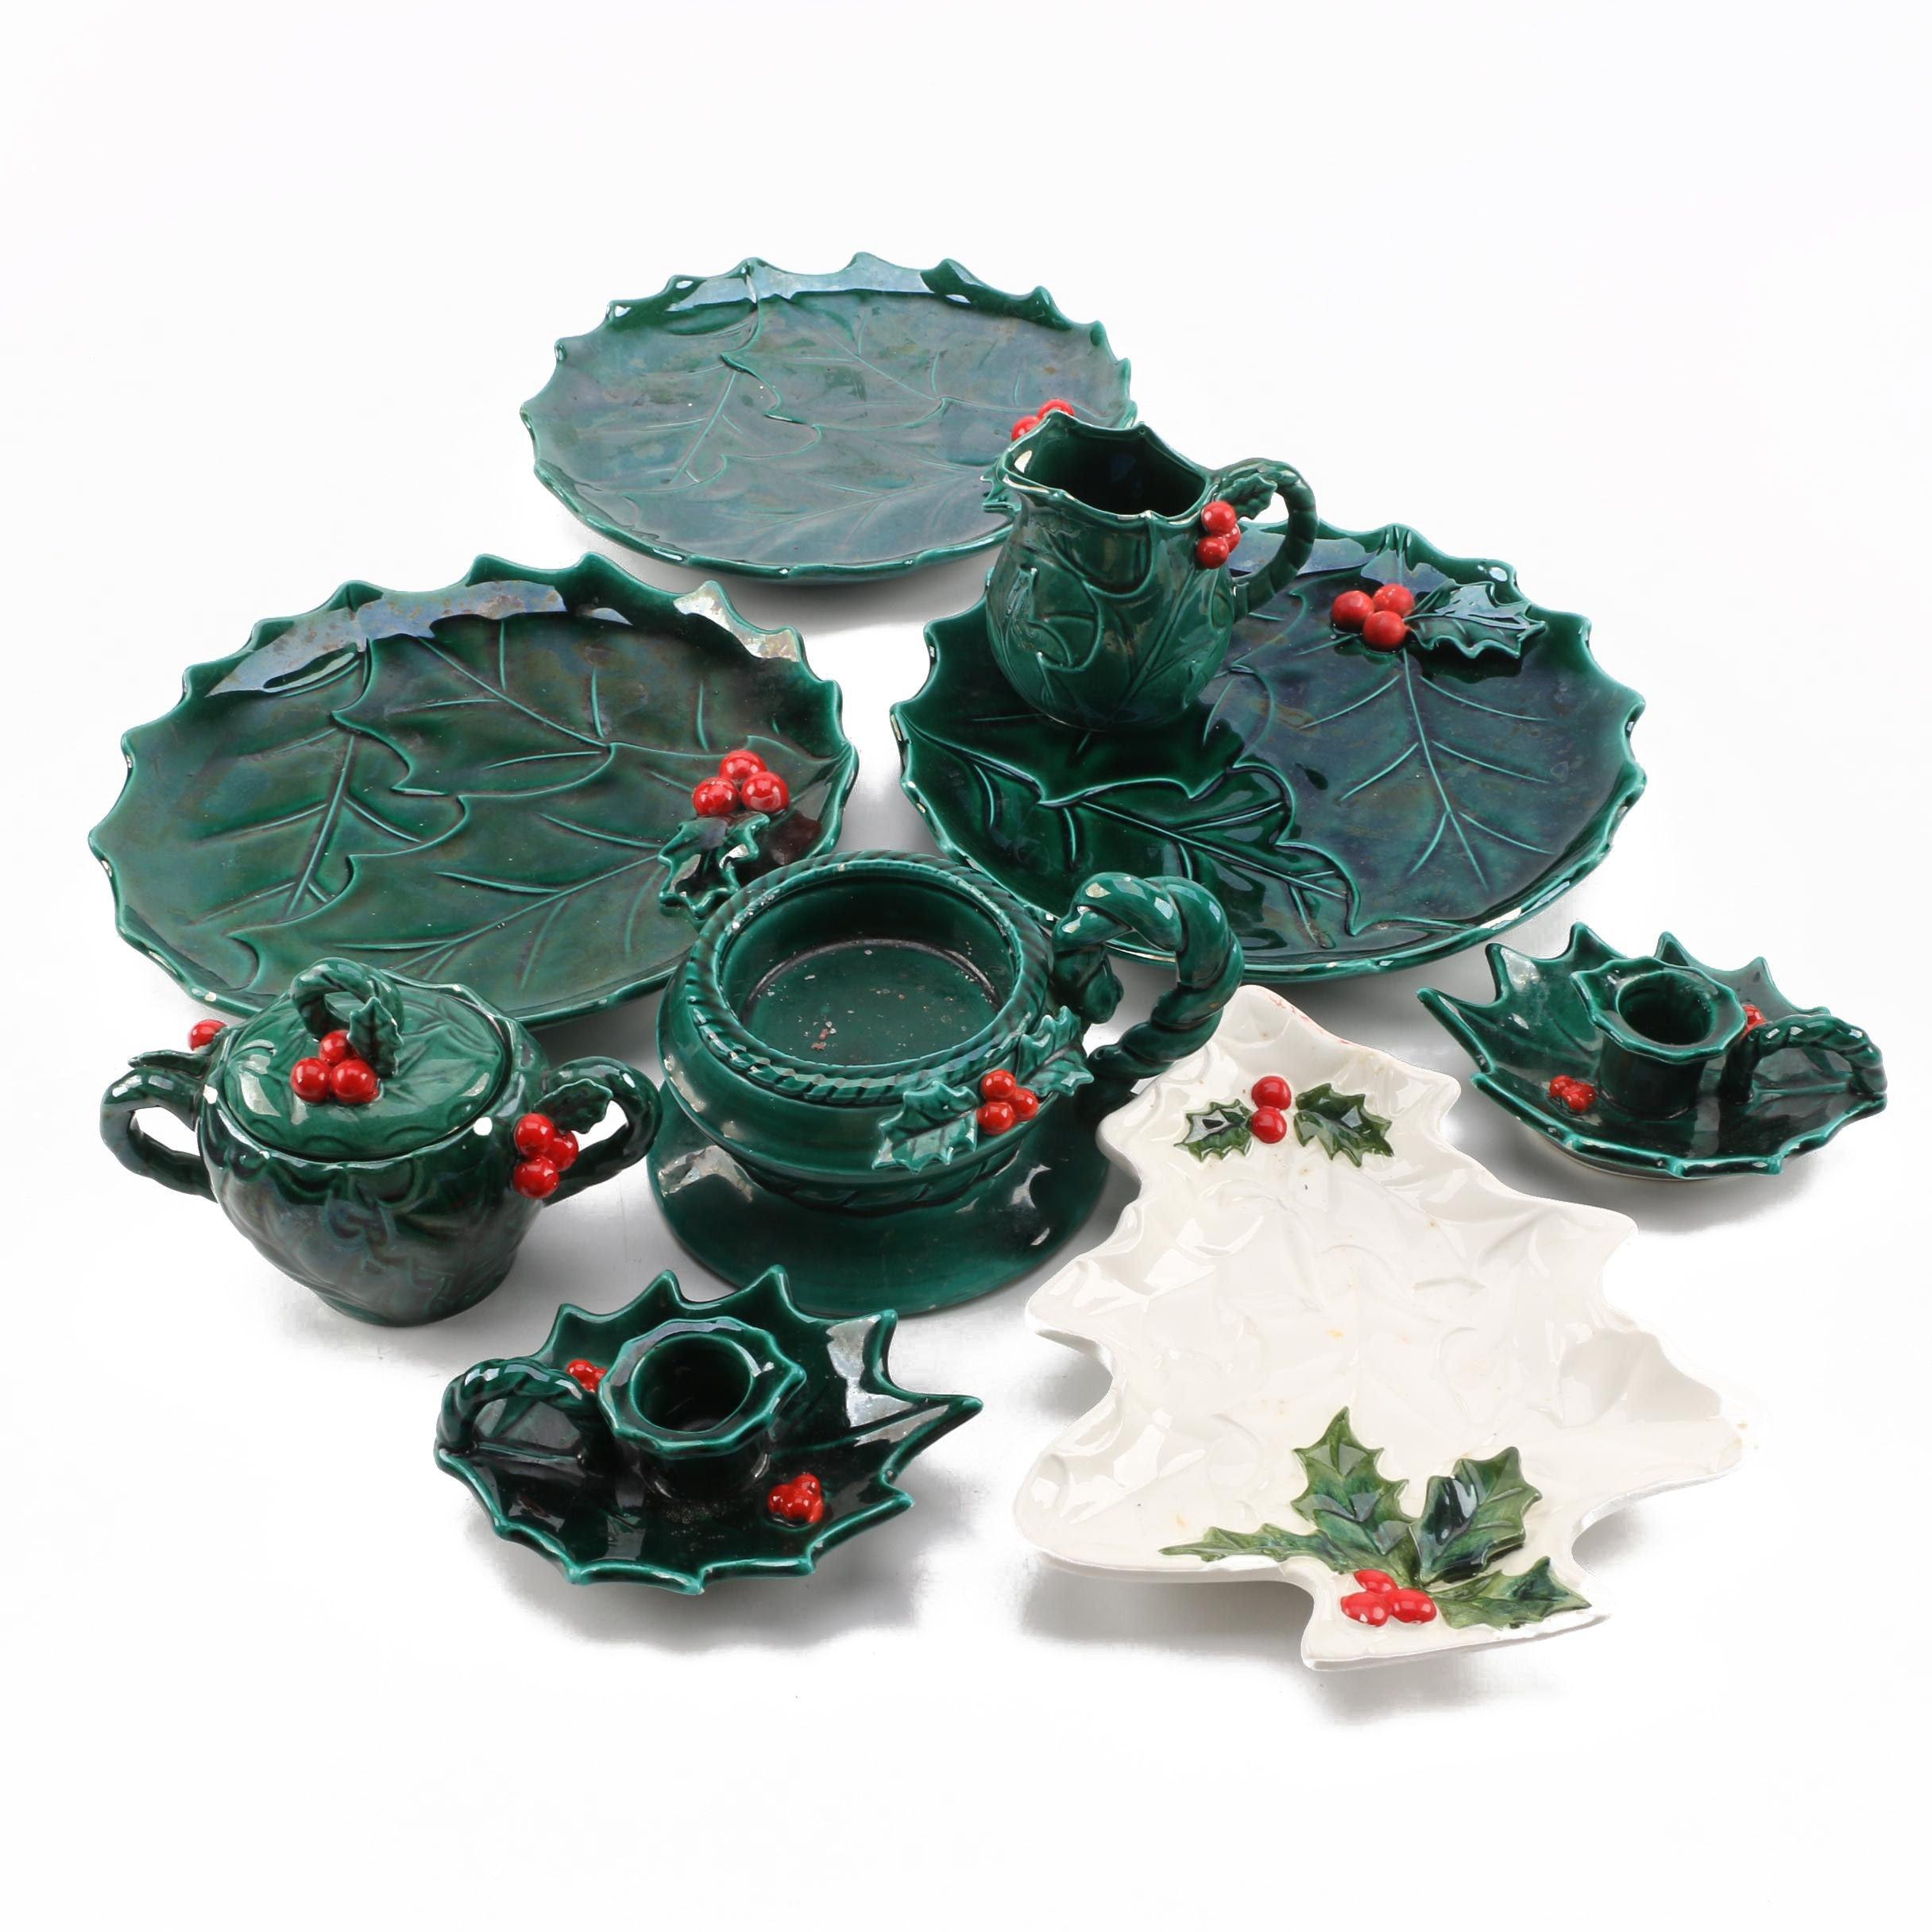 Vintage Lefton Christmas Holly Tableware 1970s